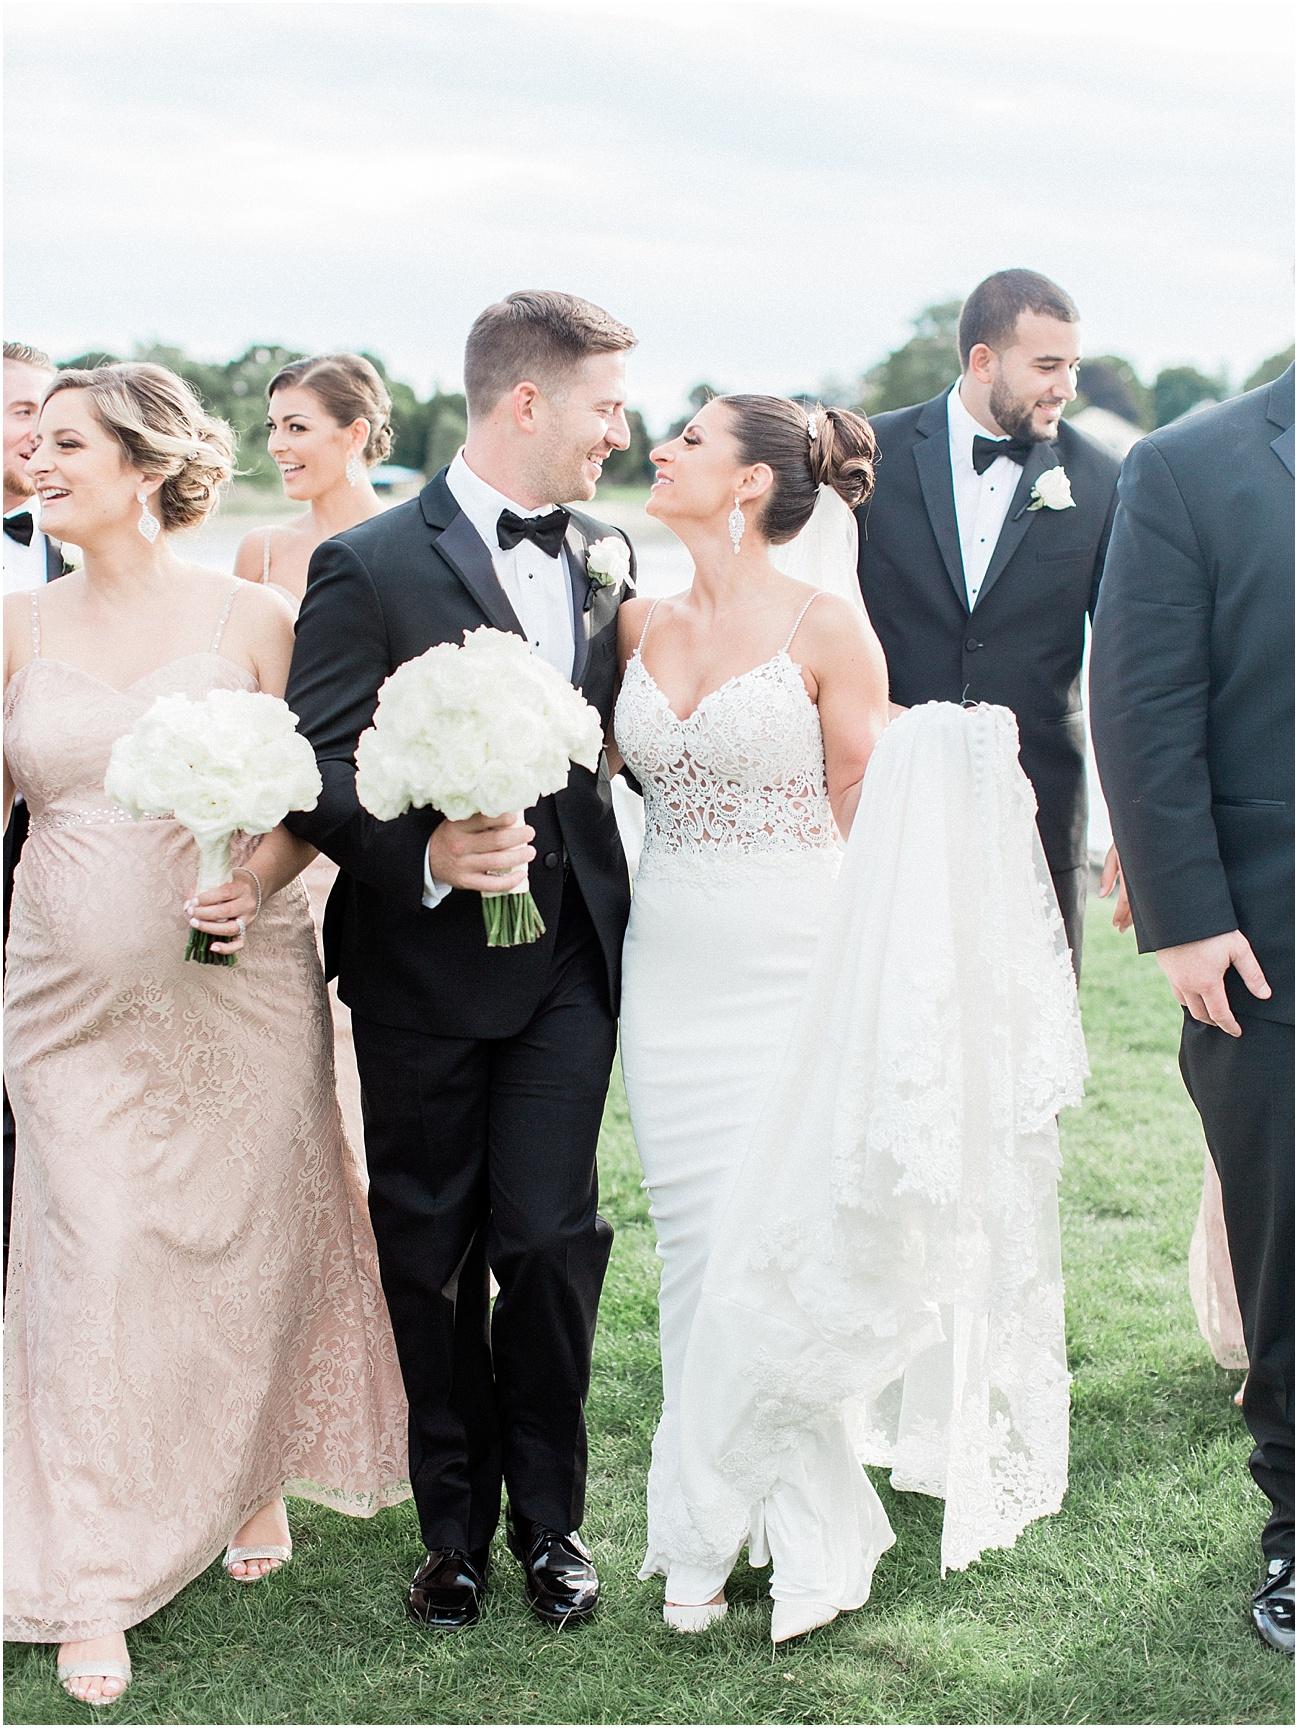 bianca_chris_danversport_italian_blush_gold_north_shore_cape_cod_boston_wedding_photographer_meredith_jane_photography_photo_1130.jpg